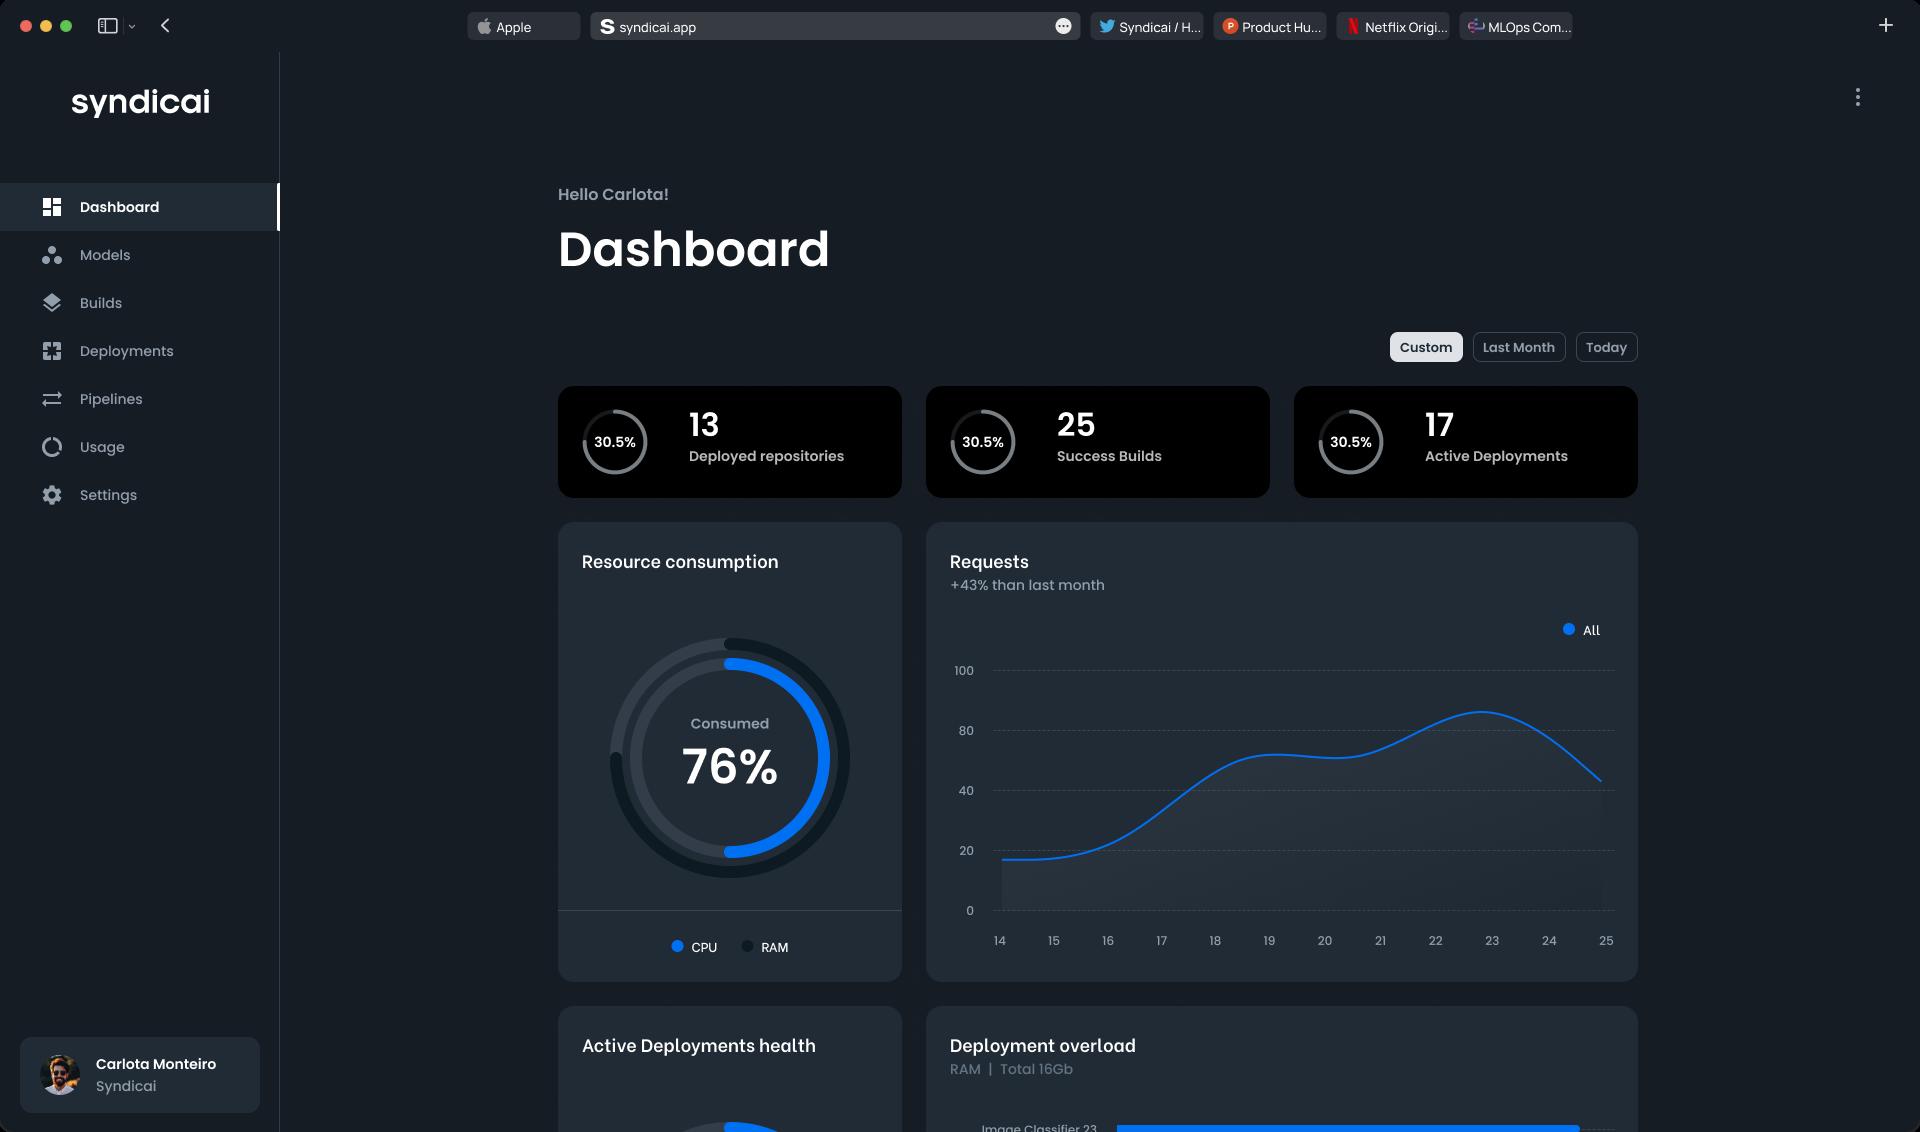 Syndicai Enterprise platform dashboard